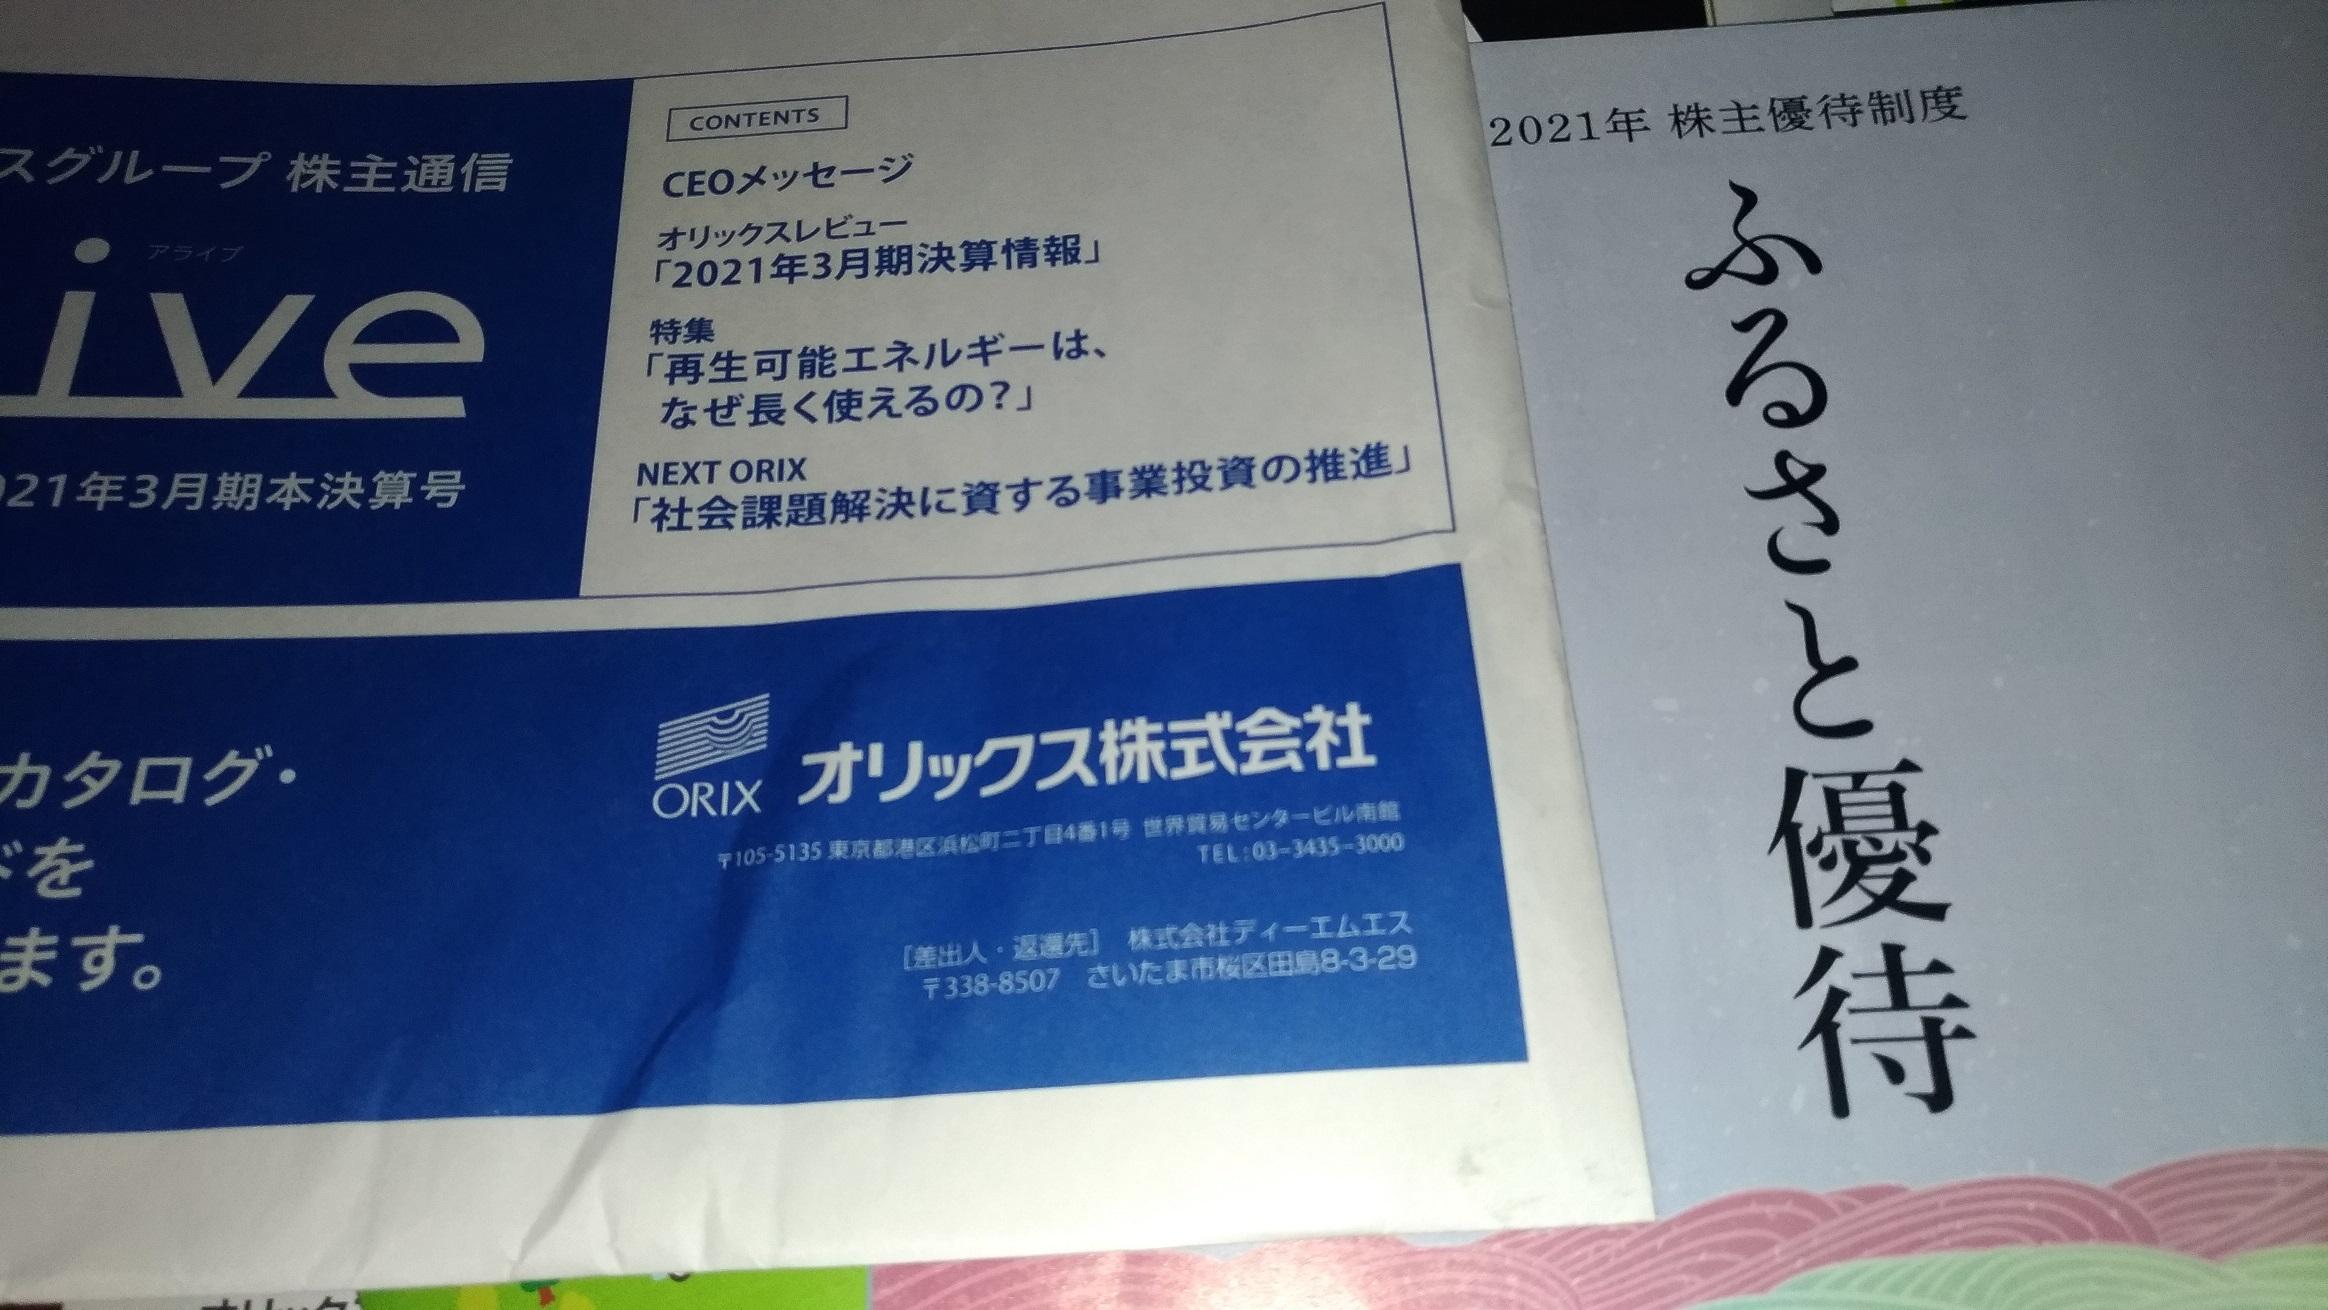 orix_2021_yutai_03_1.jpg